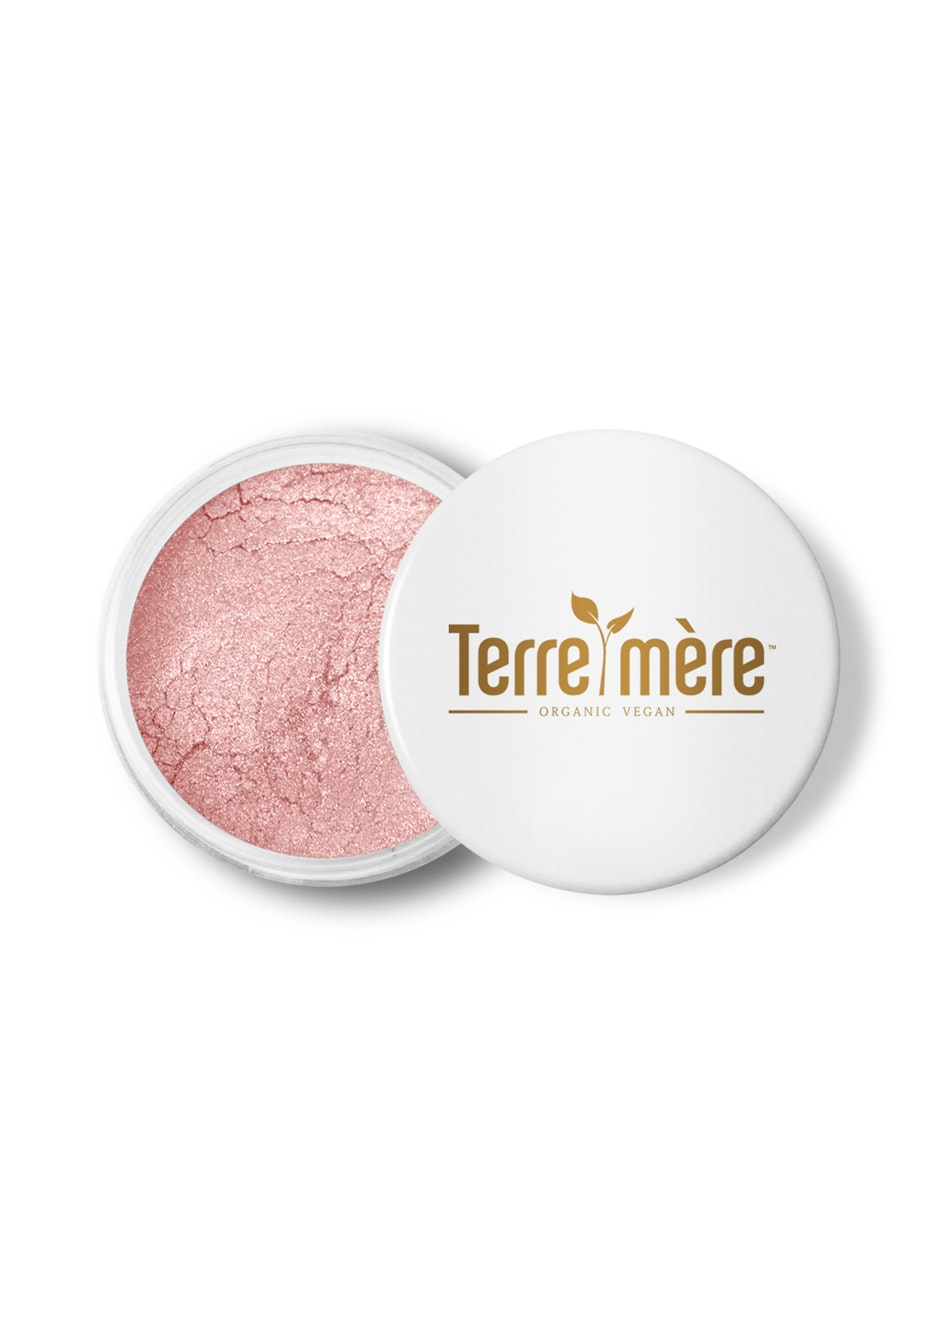 Terre Mere - Mineral Bronzer - Halite